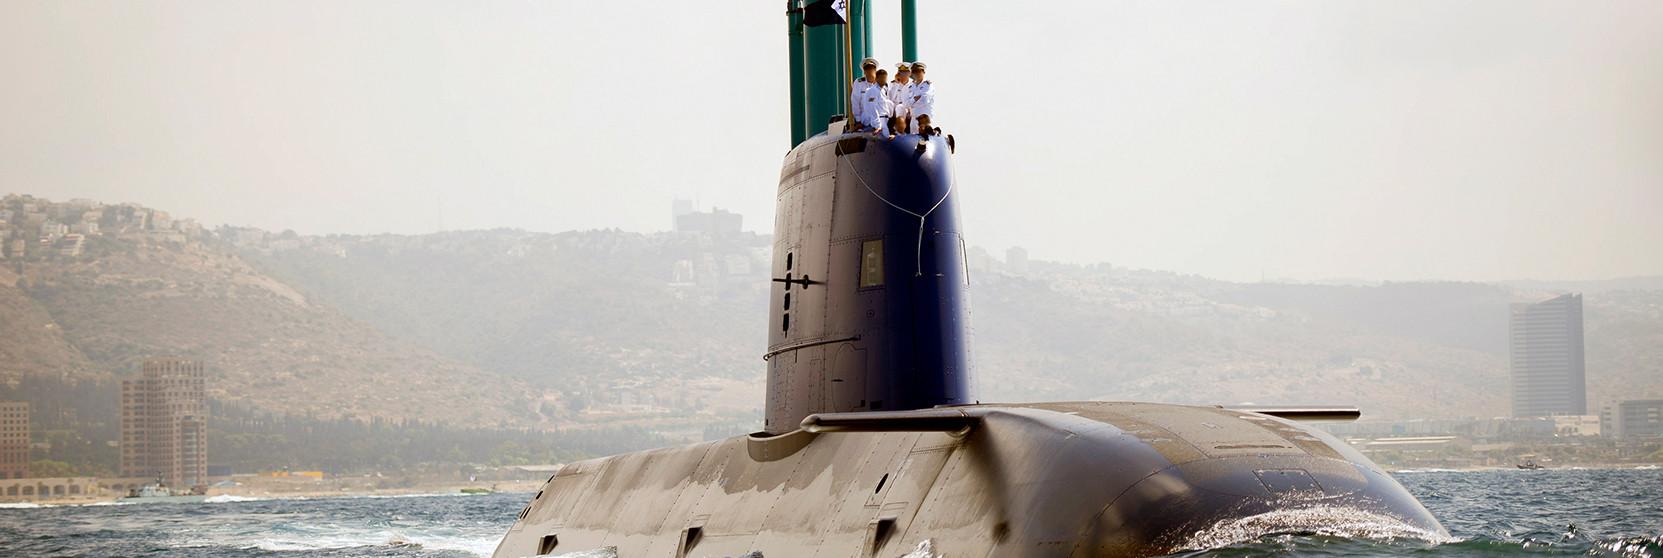 Astronautics Dolphin submarine